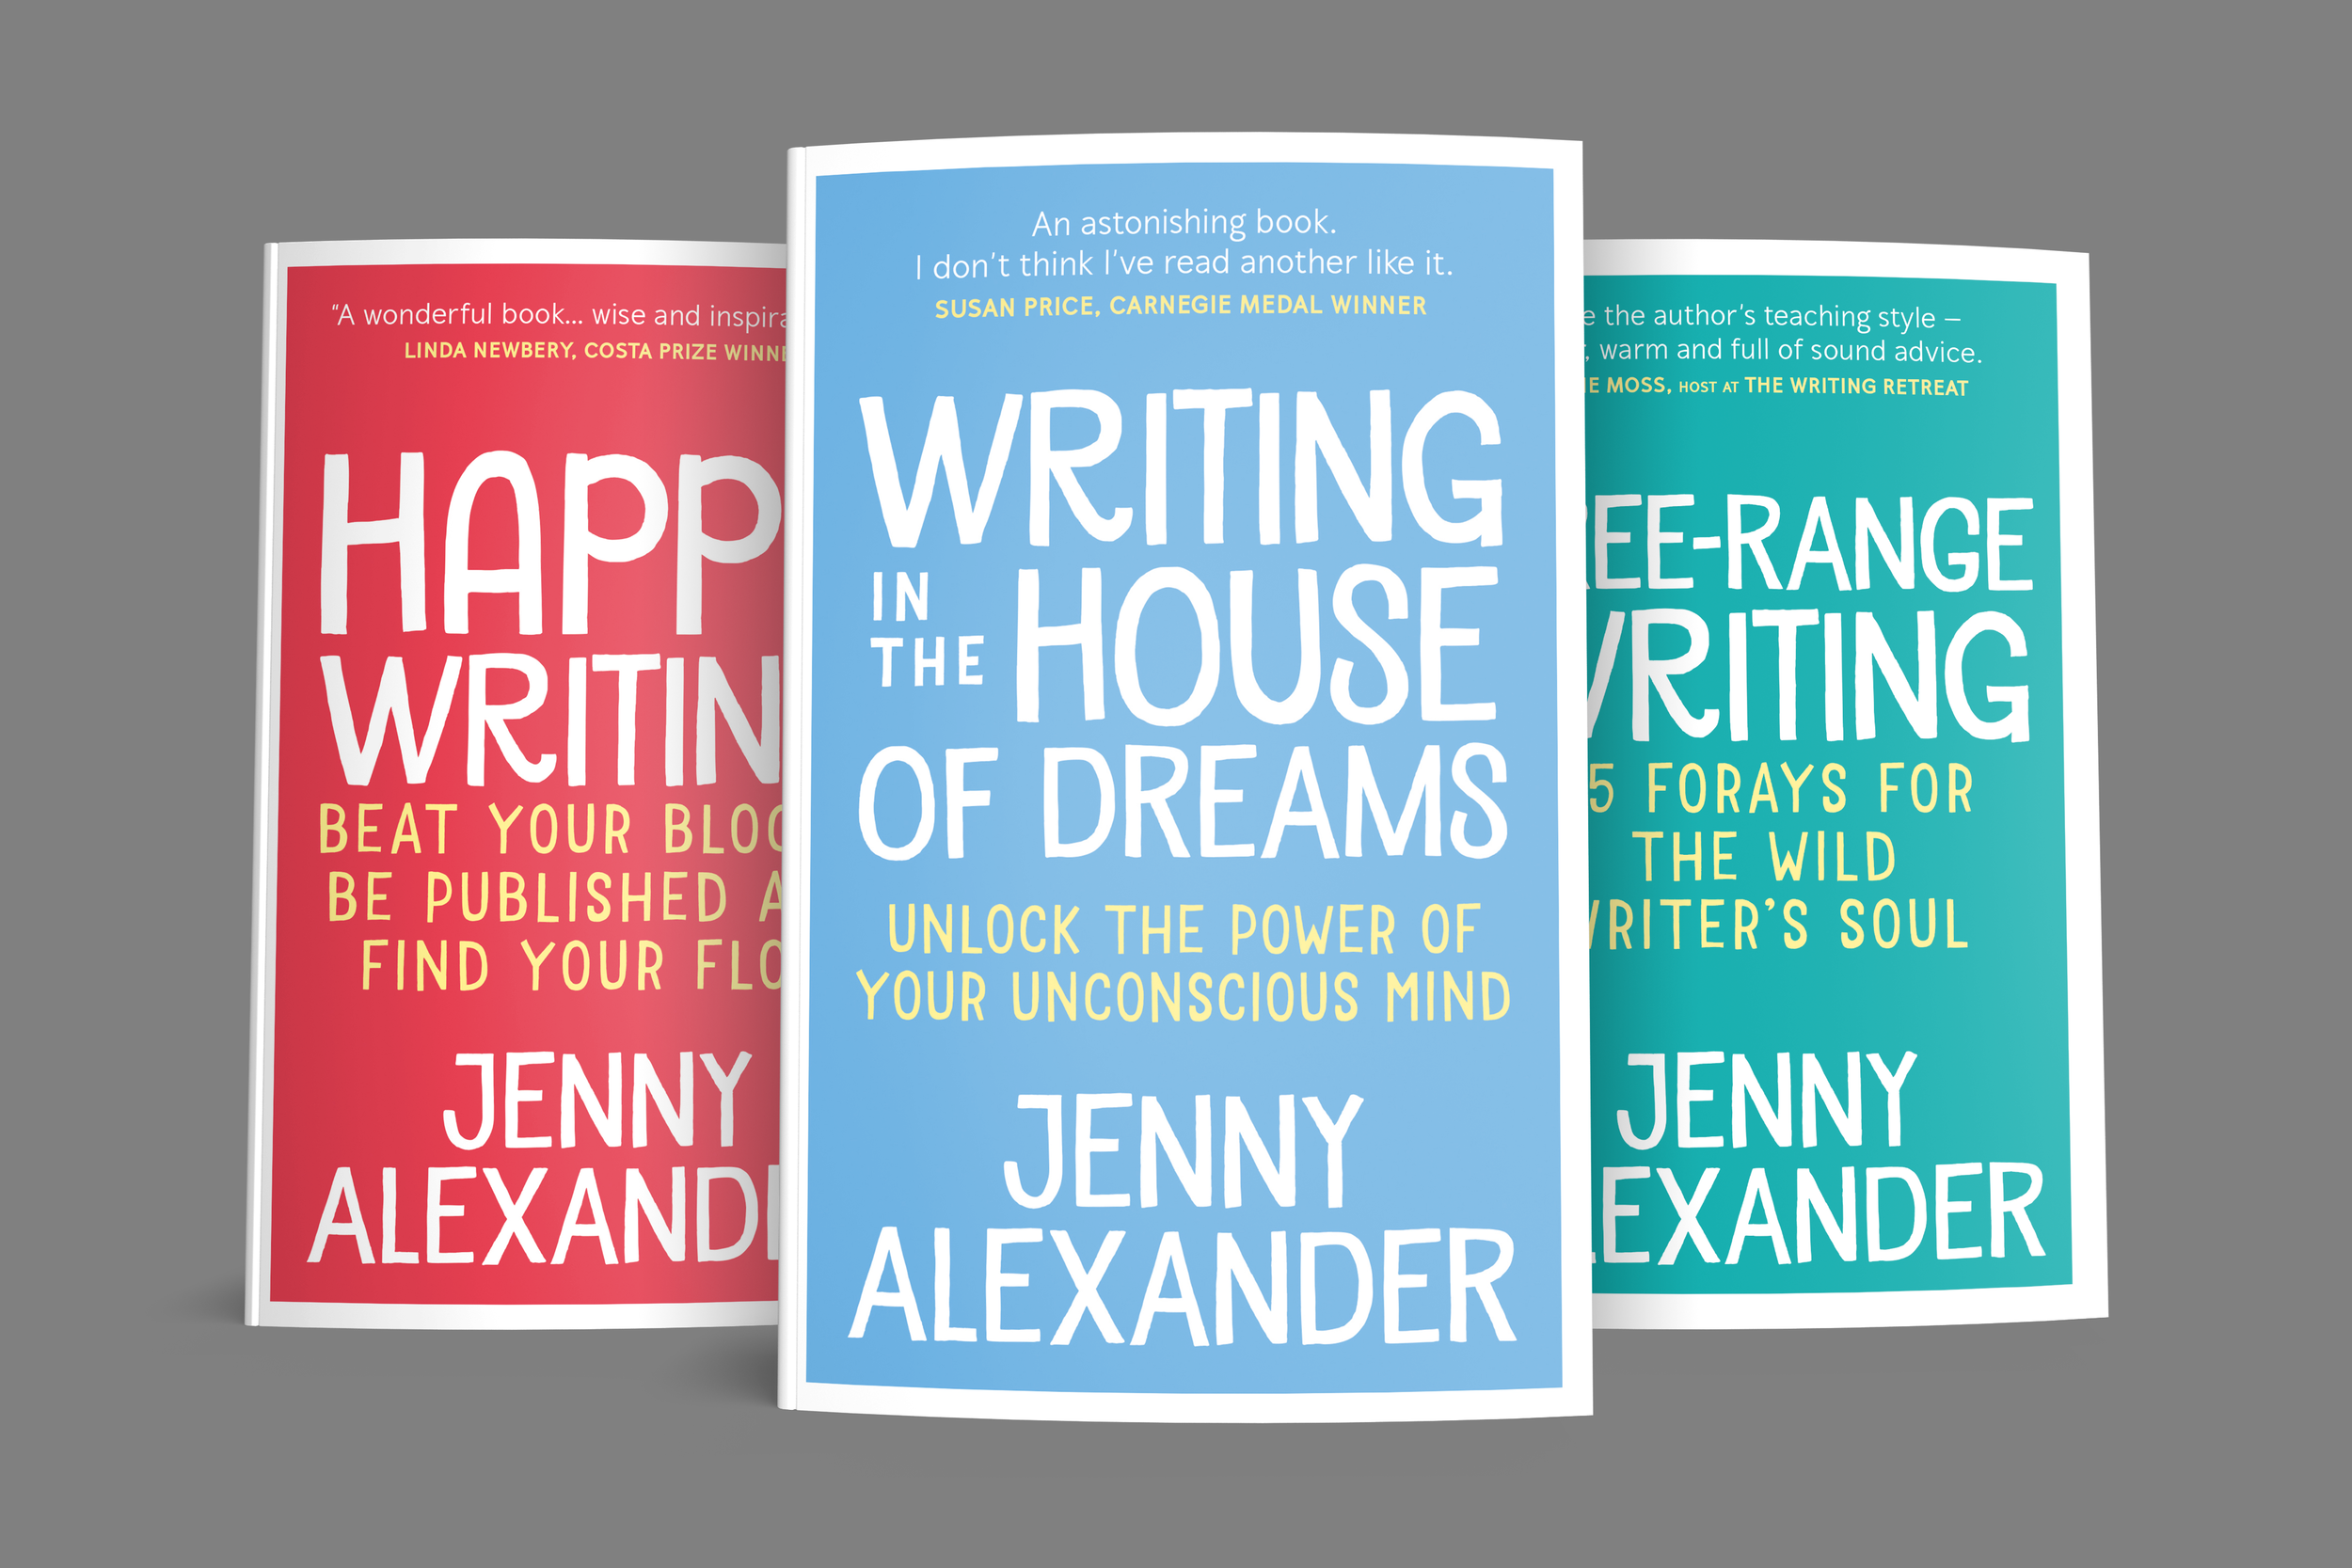 JA_WRITING_BOOKS.png